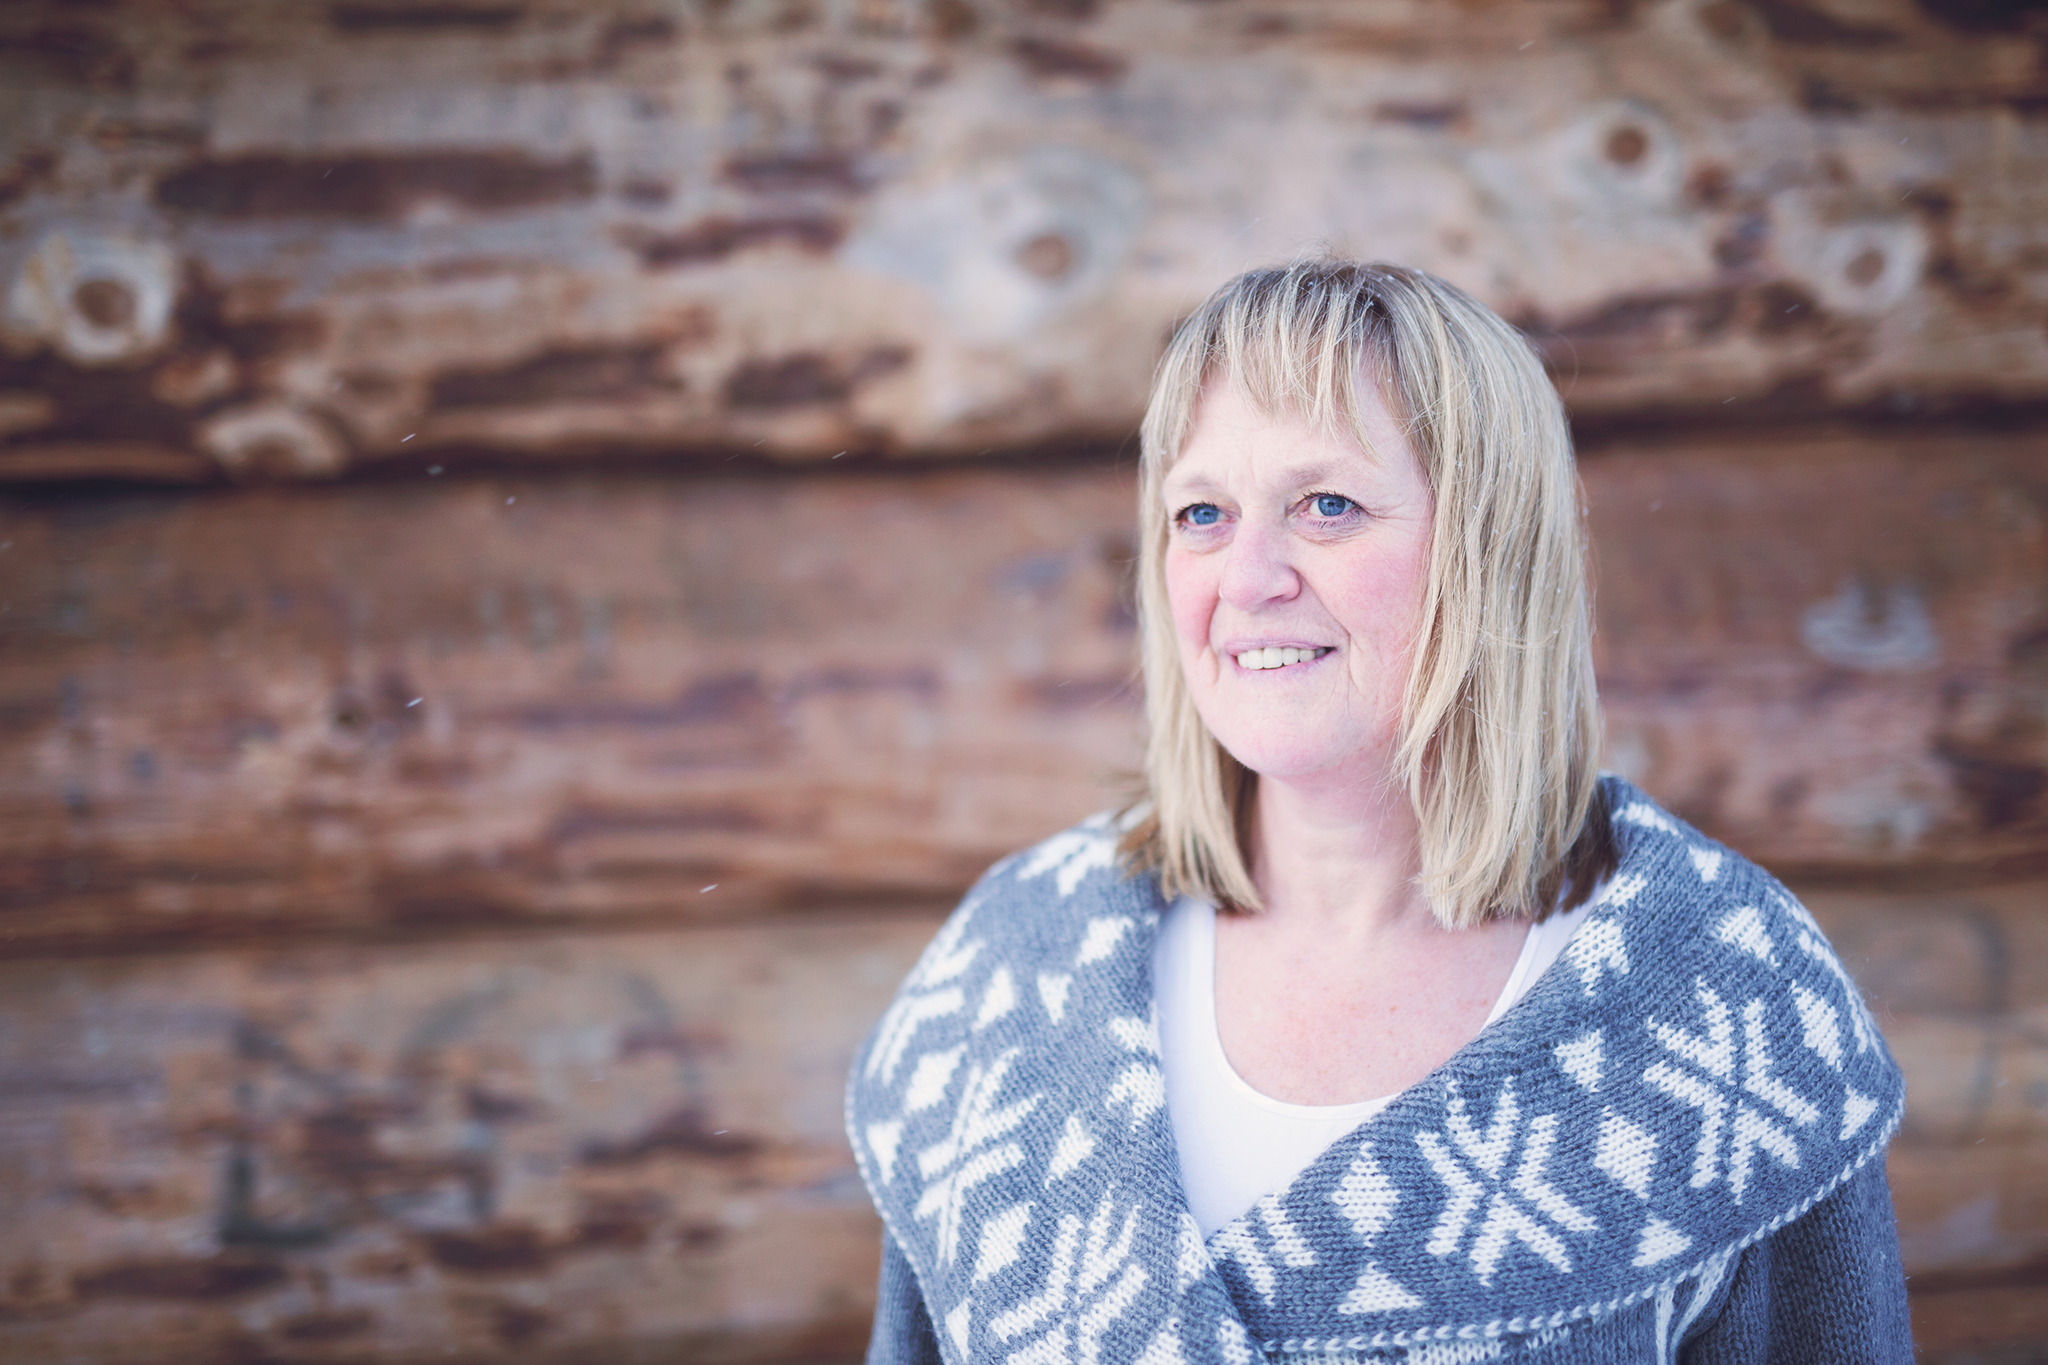 Eva Larsson, Generalsekreterare Brottsofferjouren Sverige. Foto: Jessica Larsson